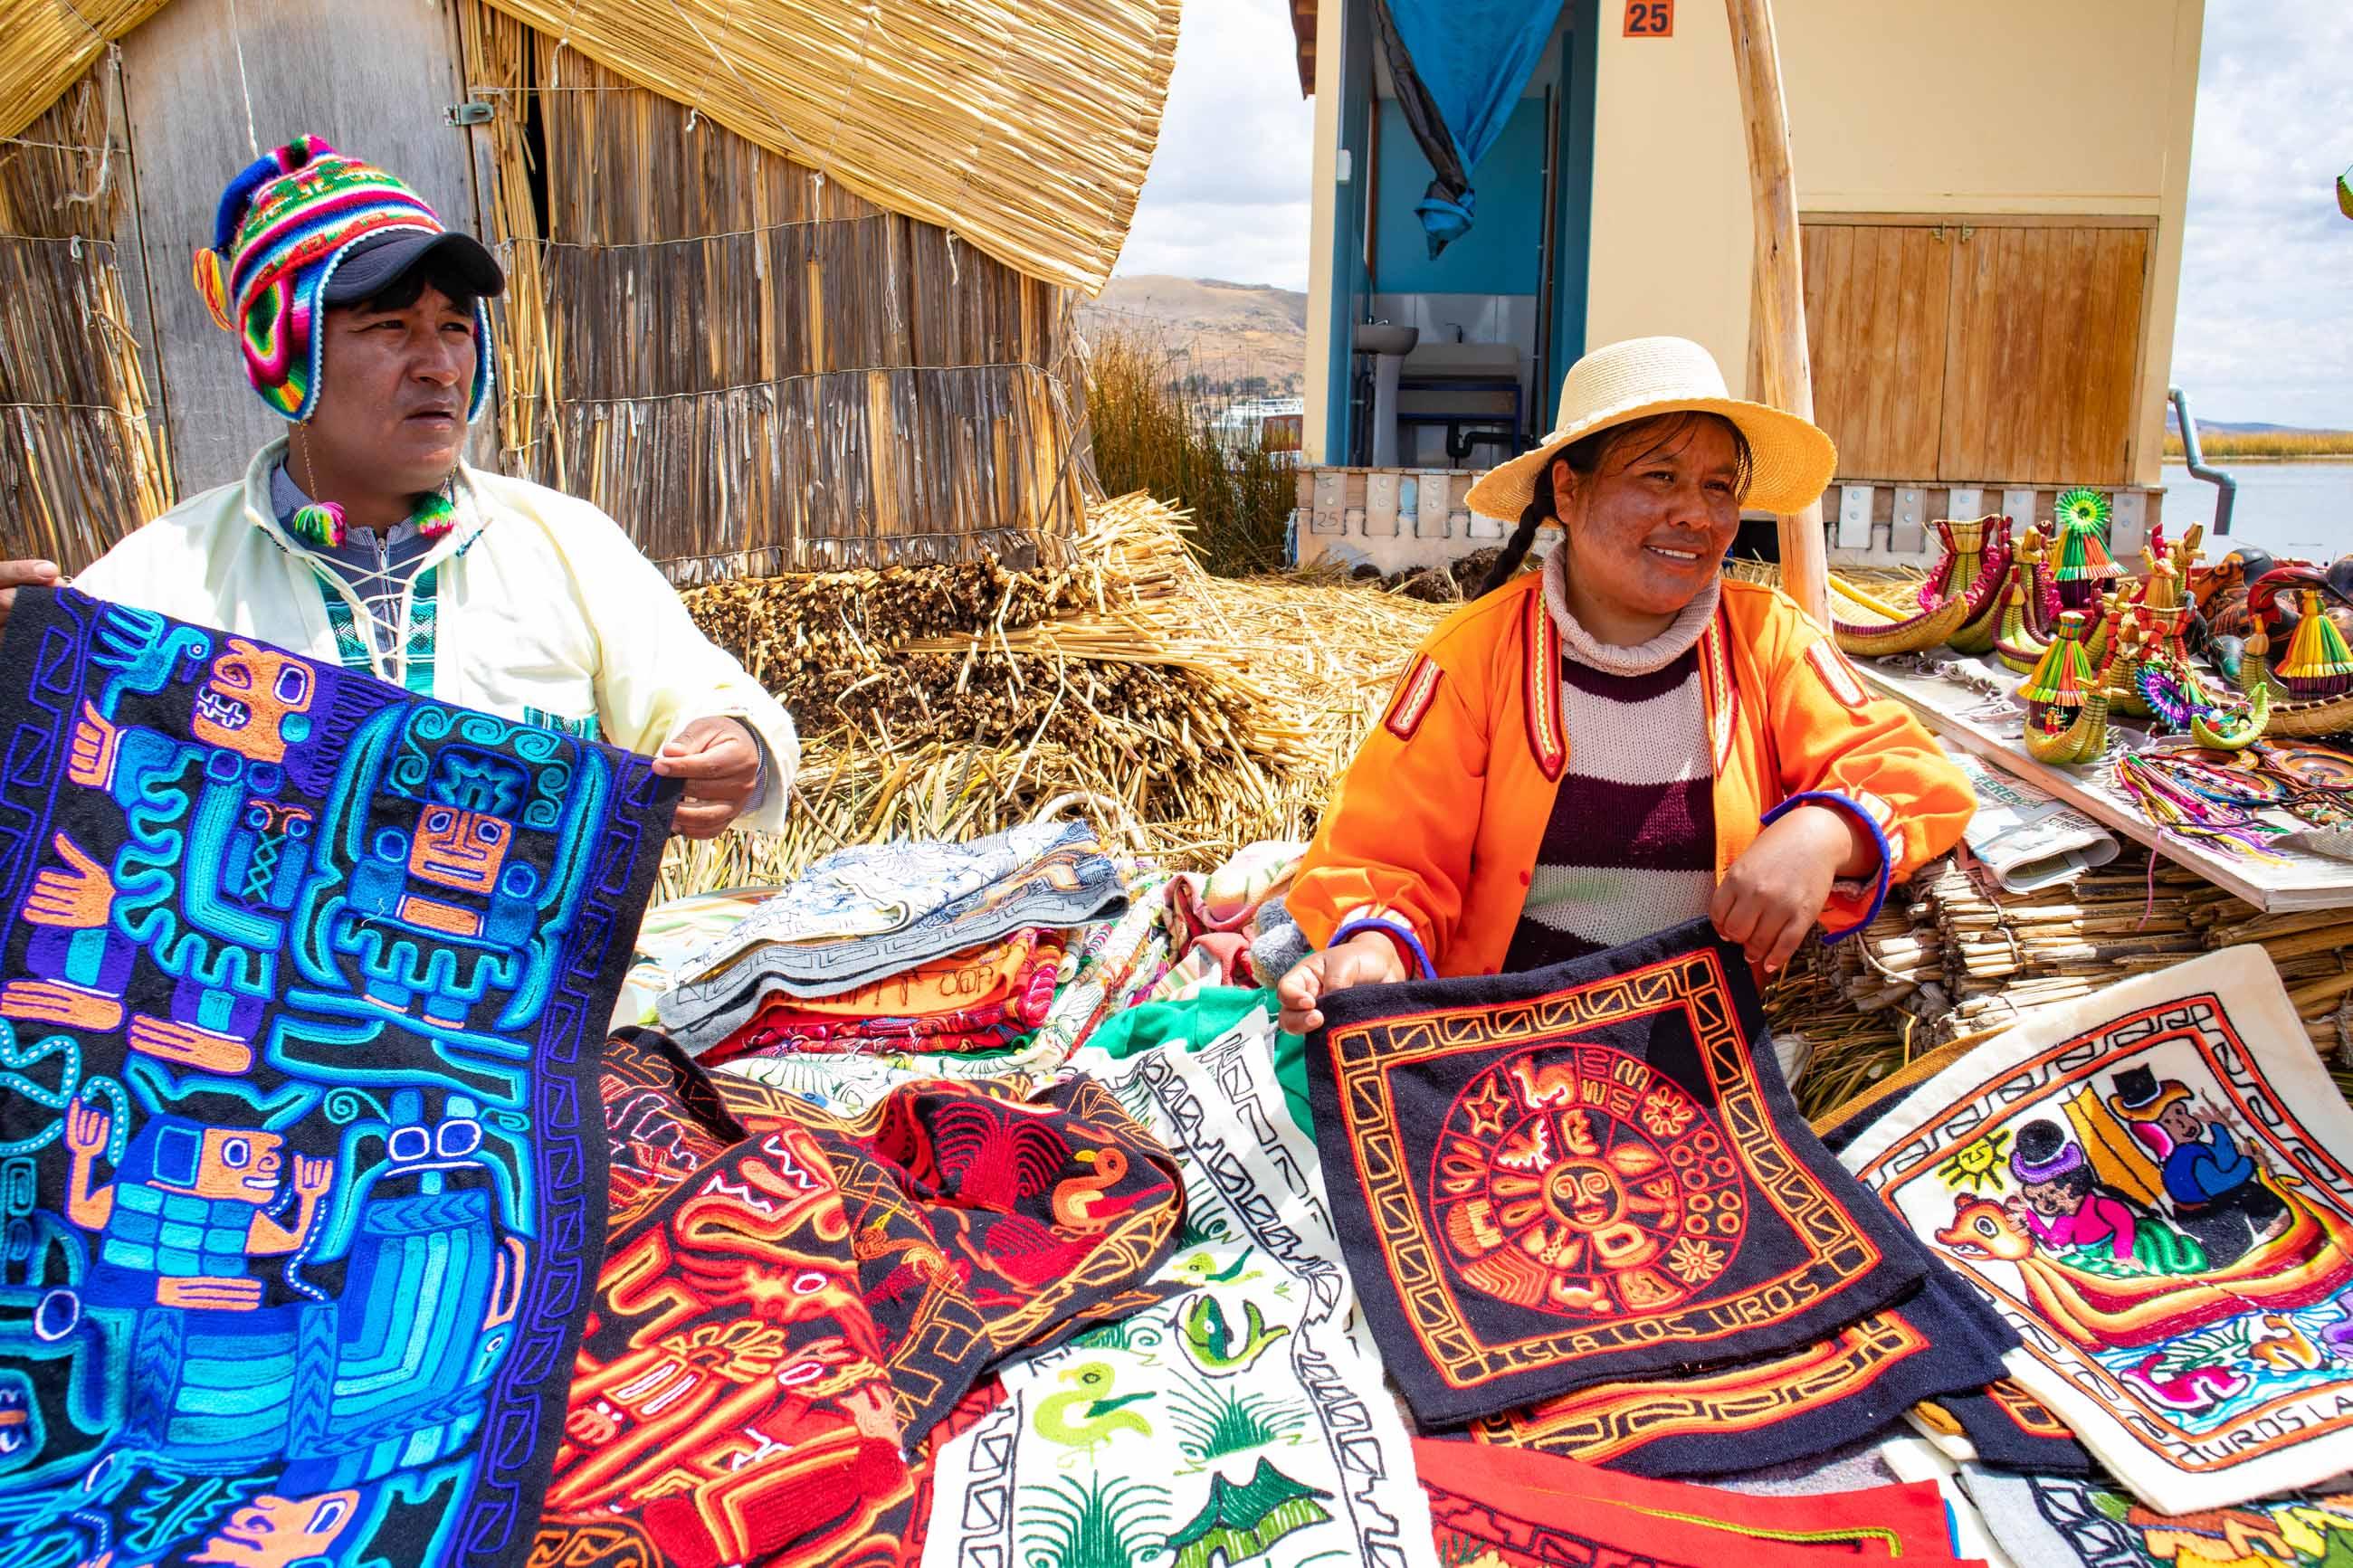 https://bubo.sk/uploads/galleries/7397/lauralackovicova_peru_titicaca_img_2596-1-114.jpg